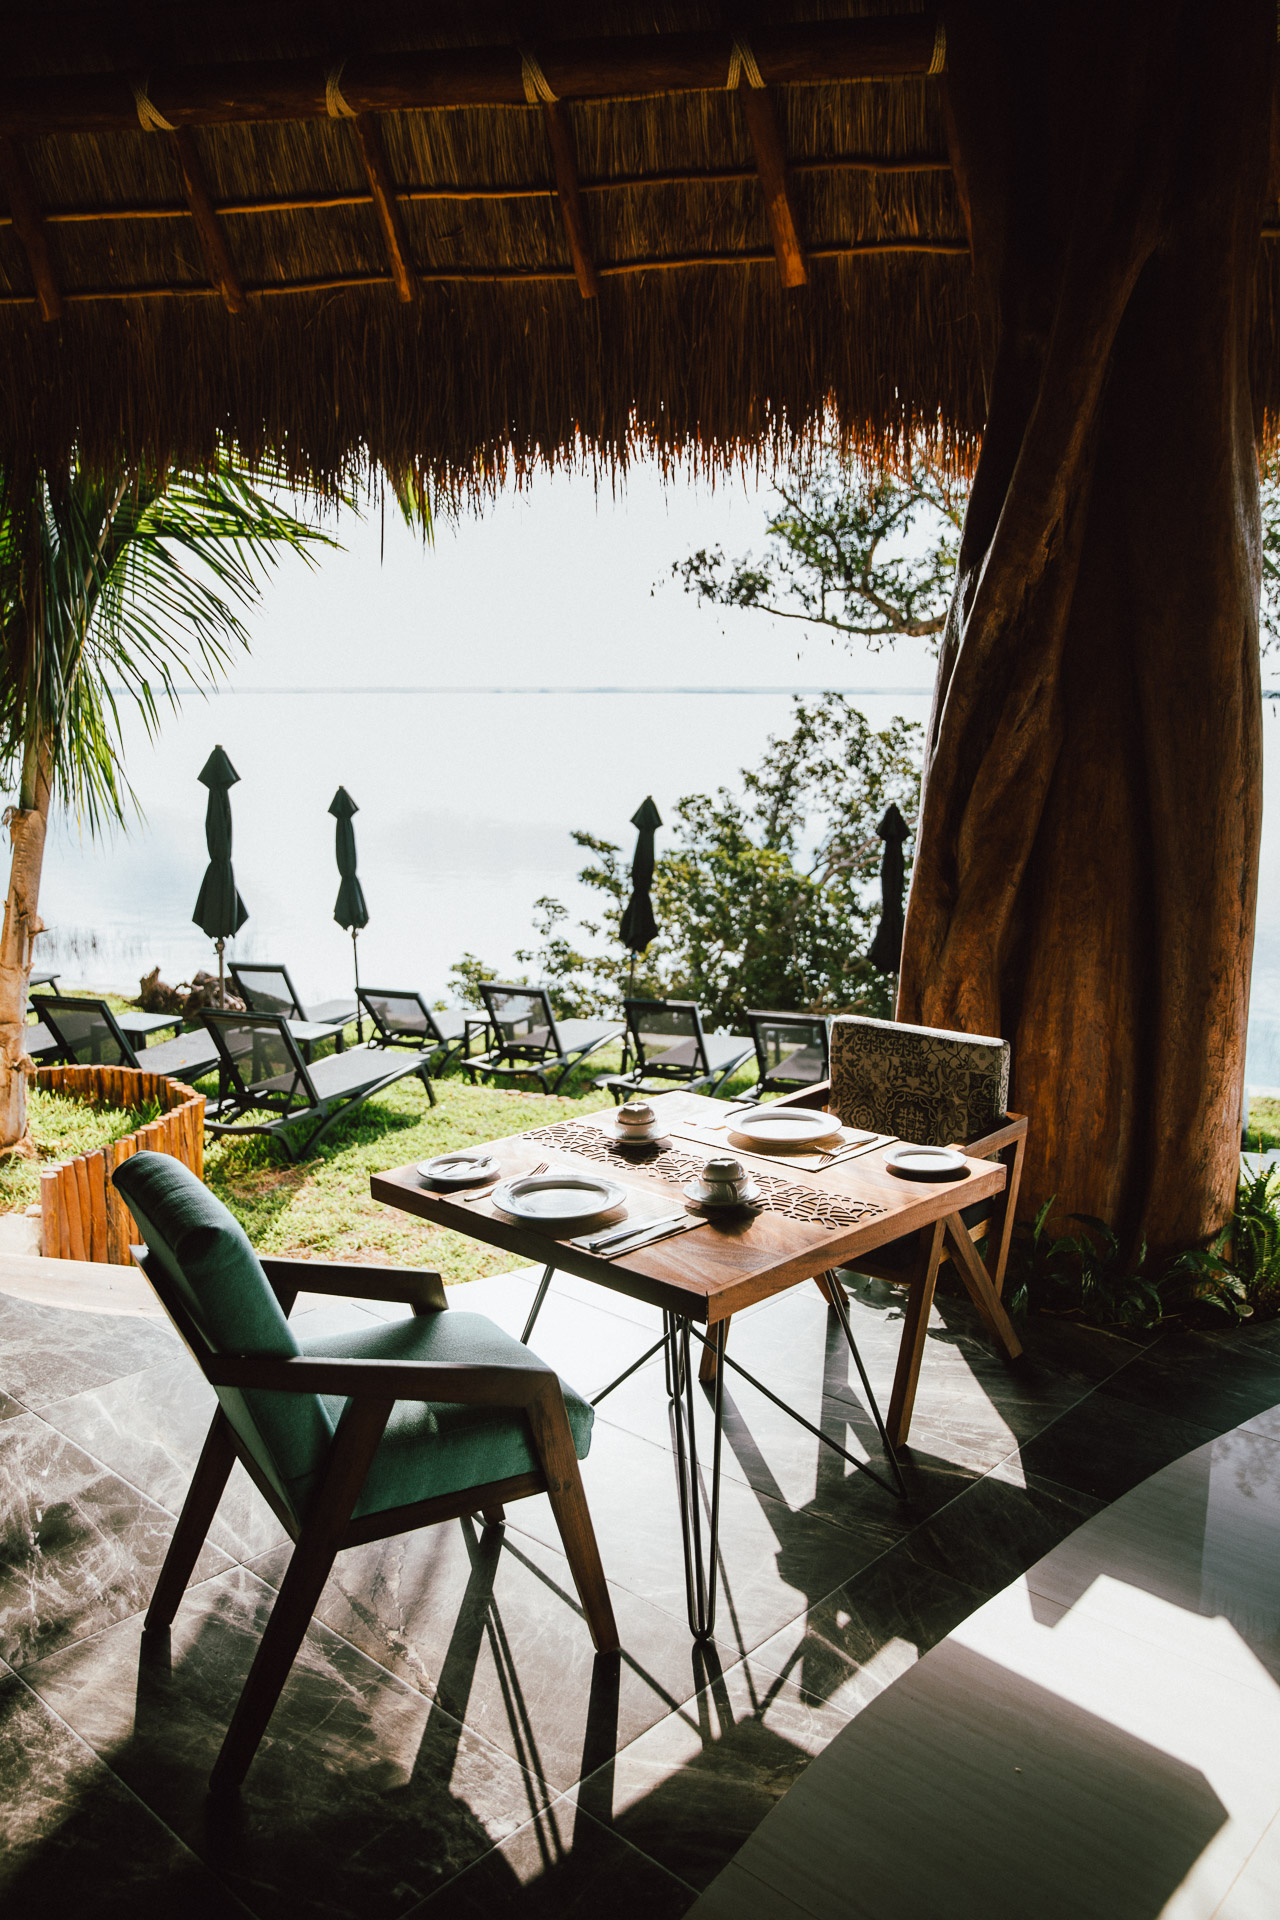 mexico-luxury-hotel-photographer-riviera-maya-mia-bacalar-13.jpg